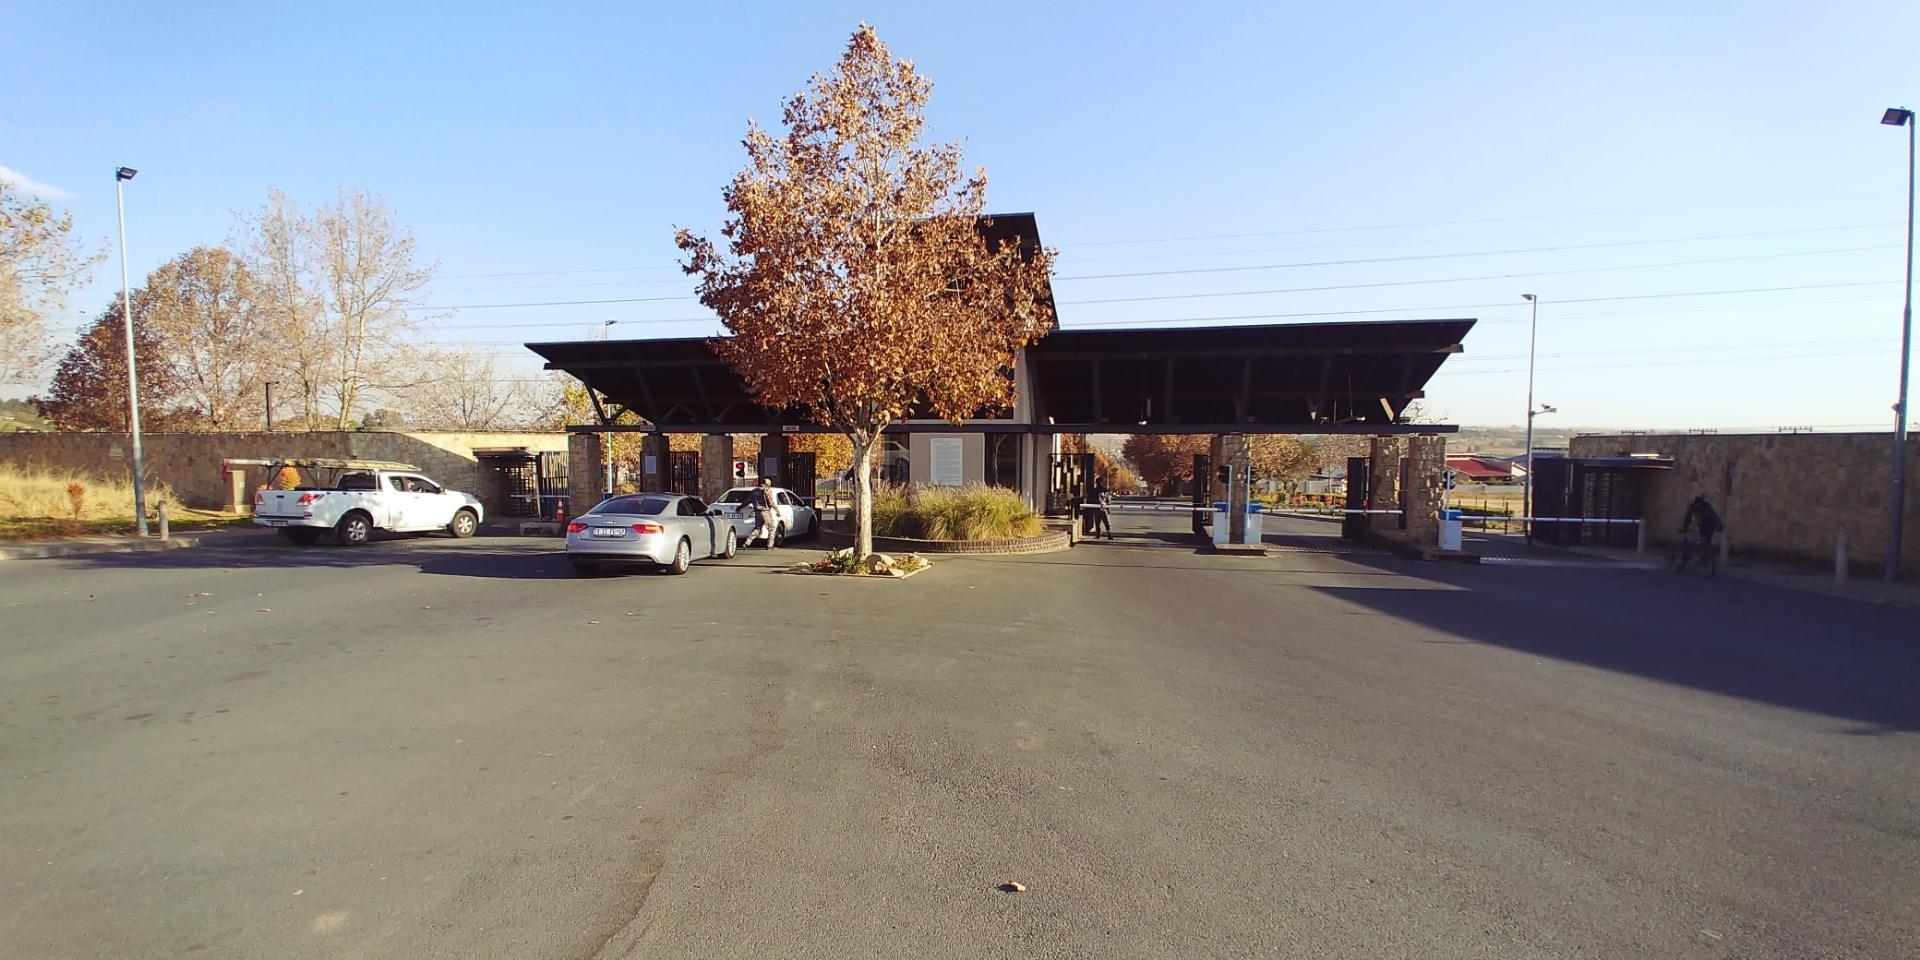 3 Bedroom House in Maroeladal, Randburg For Sale for R 1,650,000 #1859389